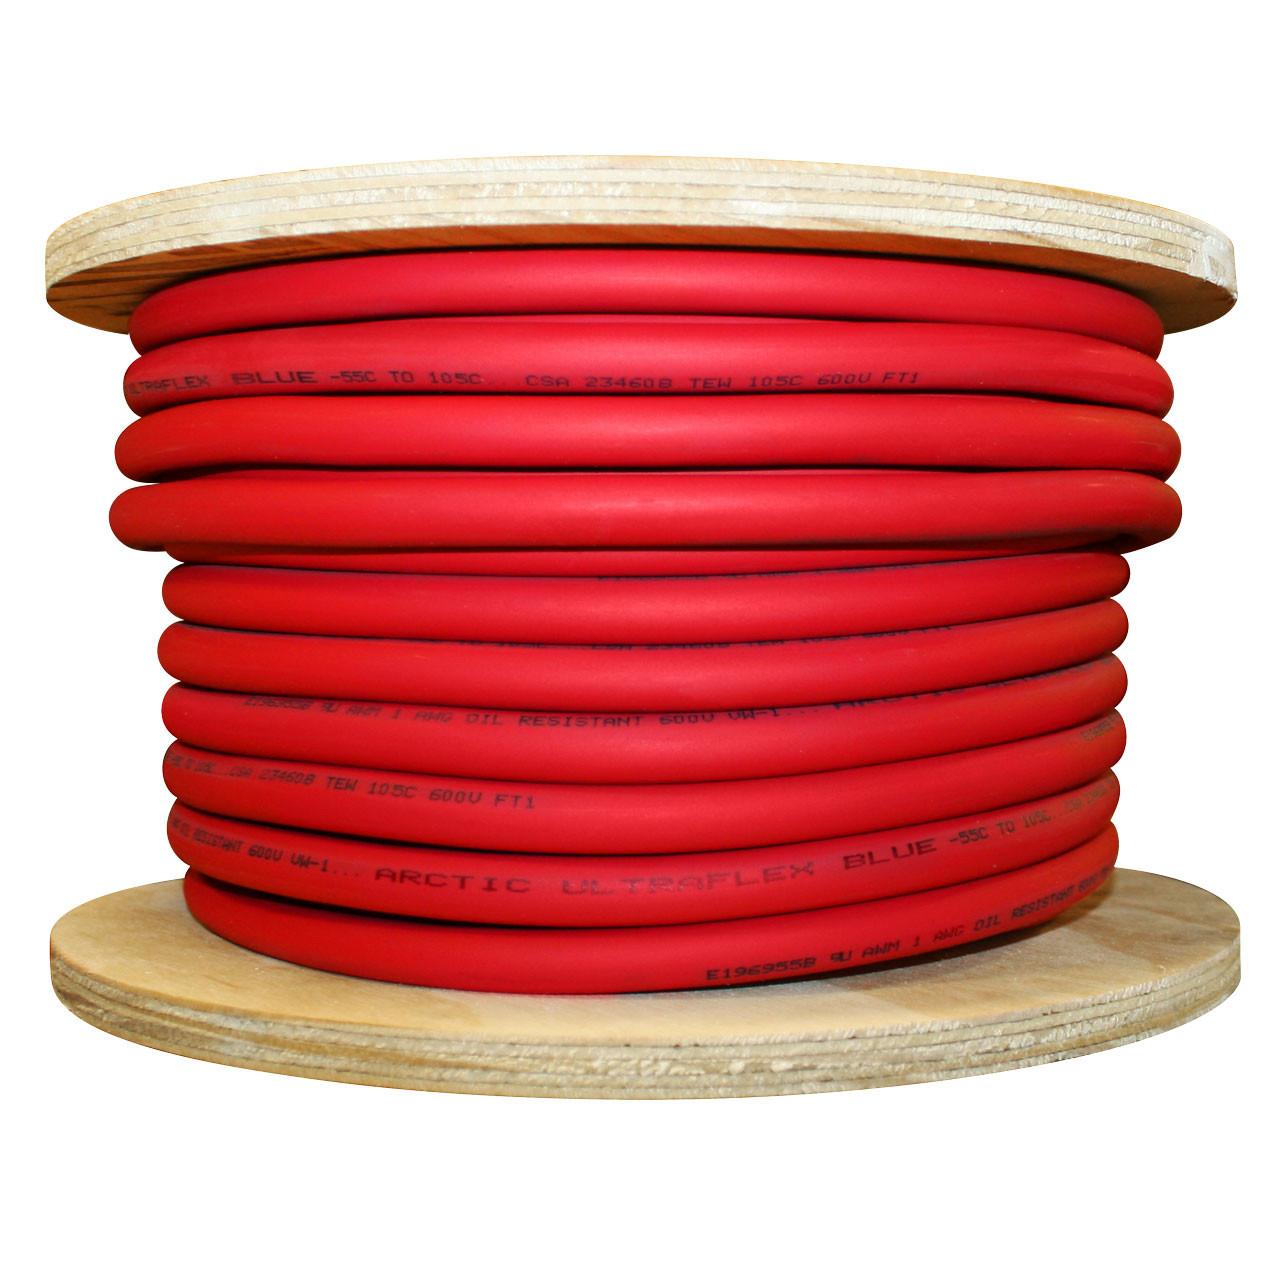 Arctic Ultraflex Blue 1 gauge single conductor 100% copper fine strand wire, 100 foot spool, red jacket